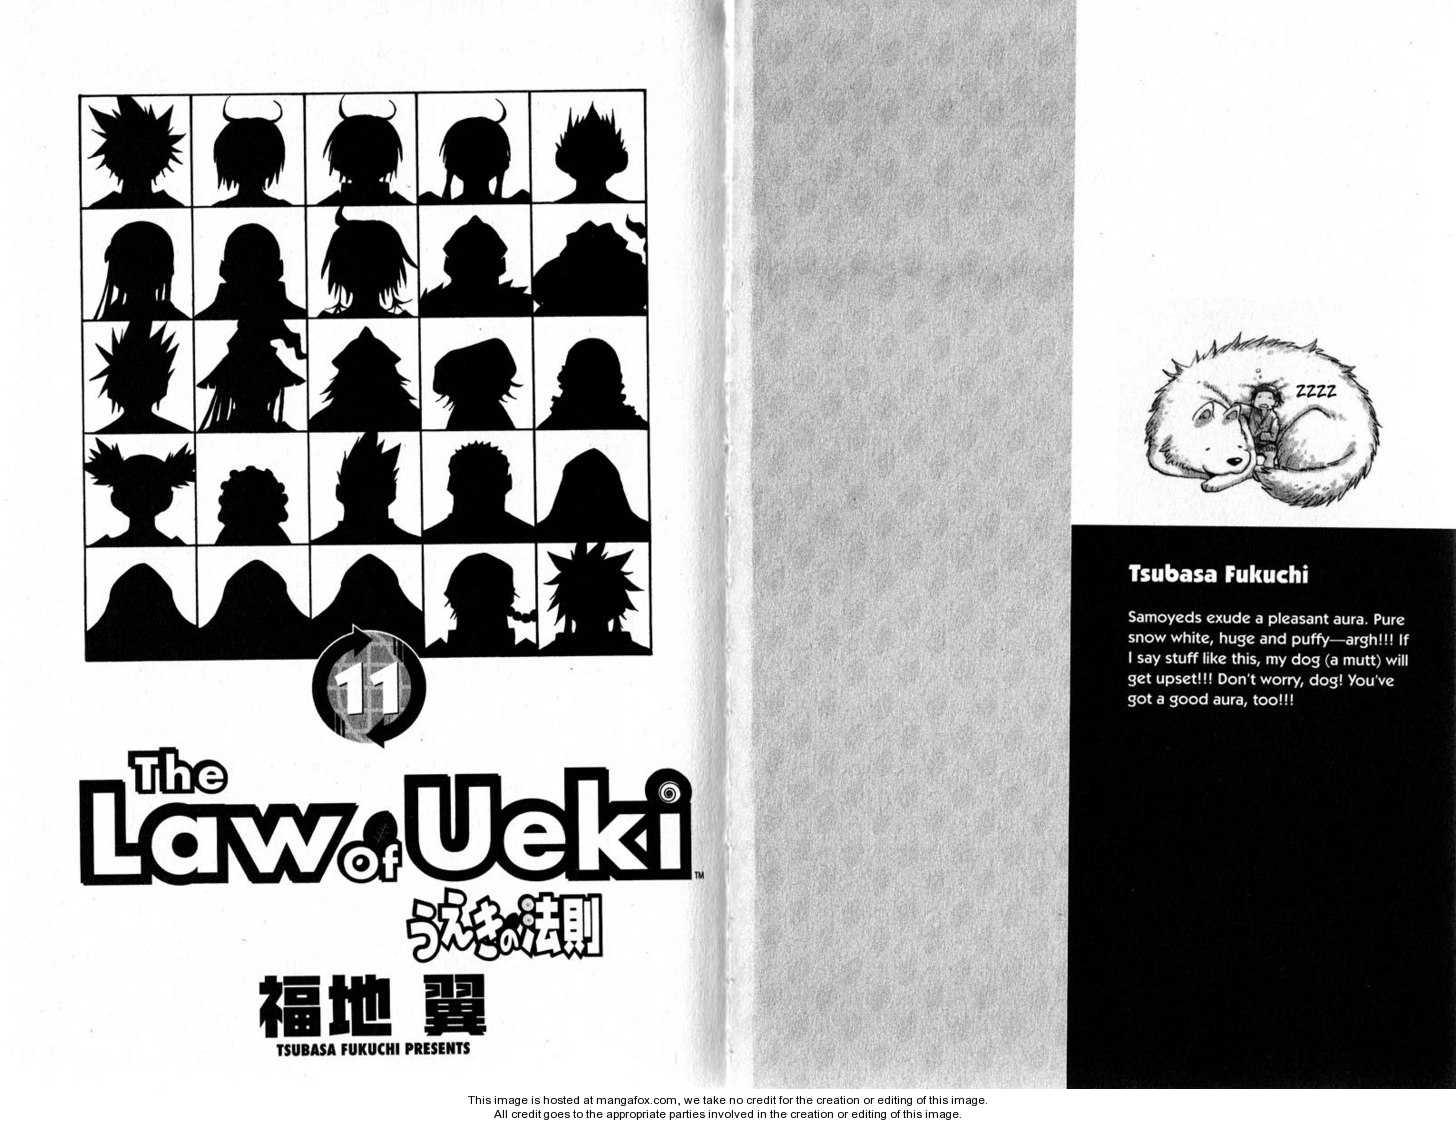 Law of Ueki 0 Page 3